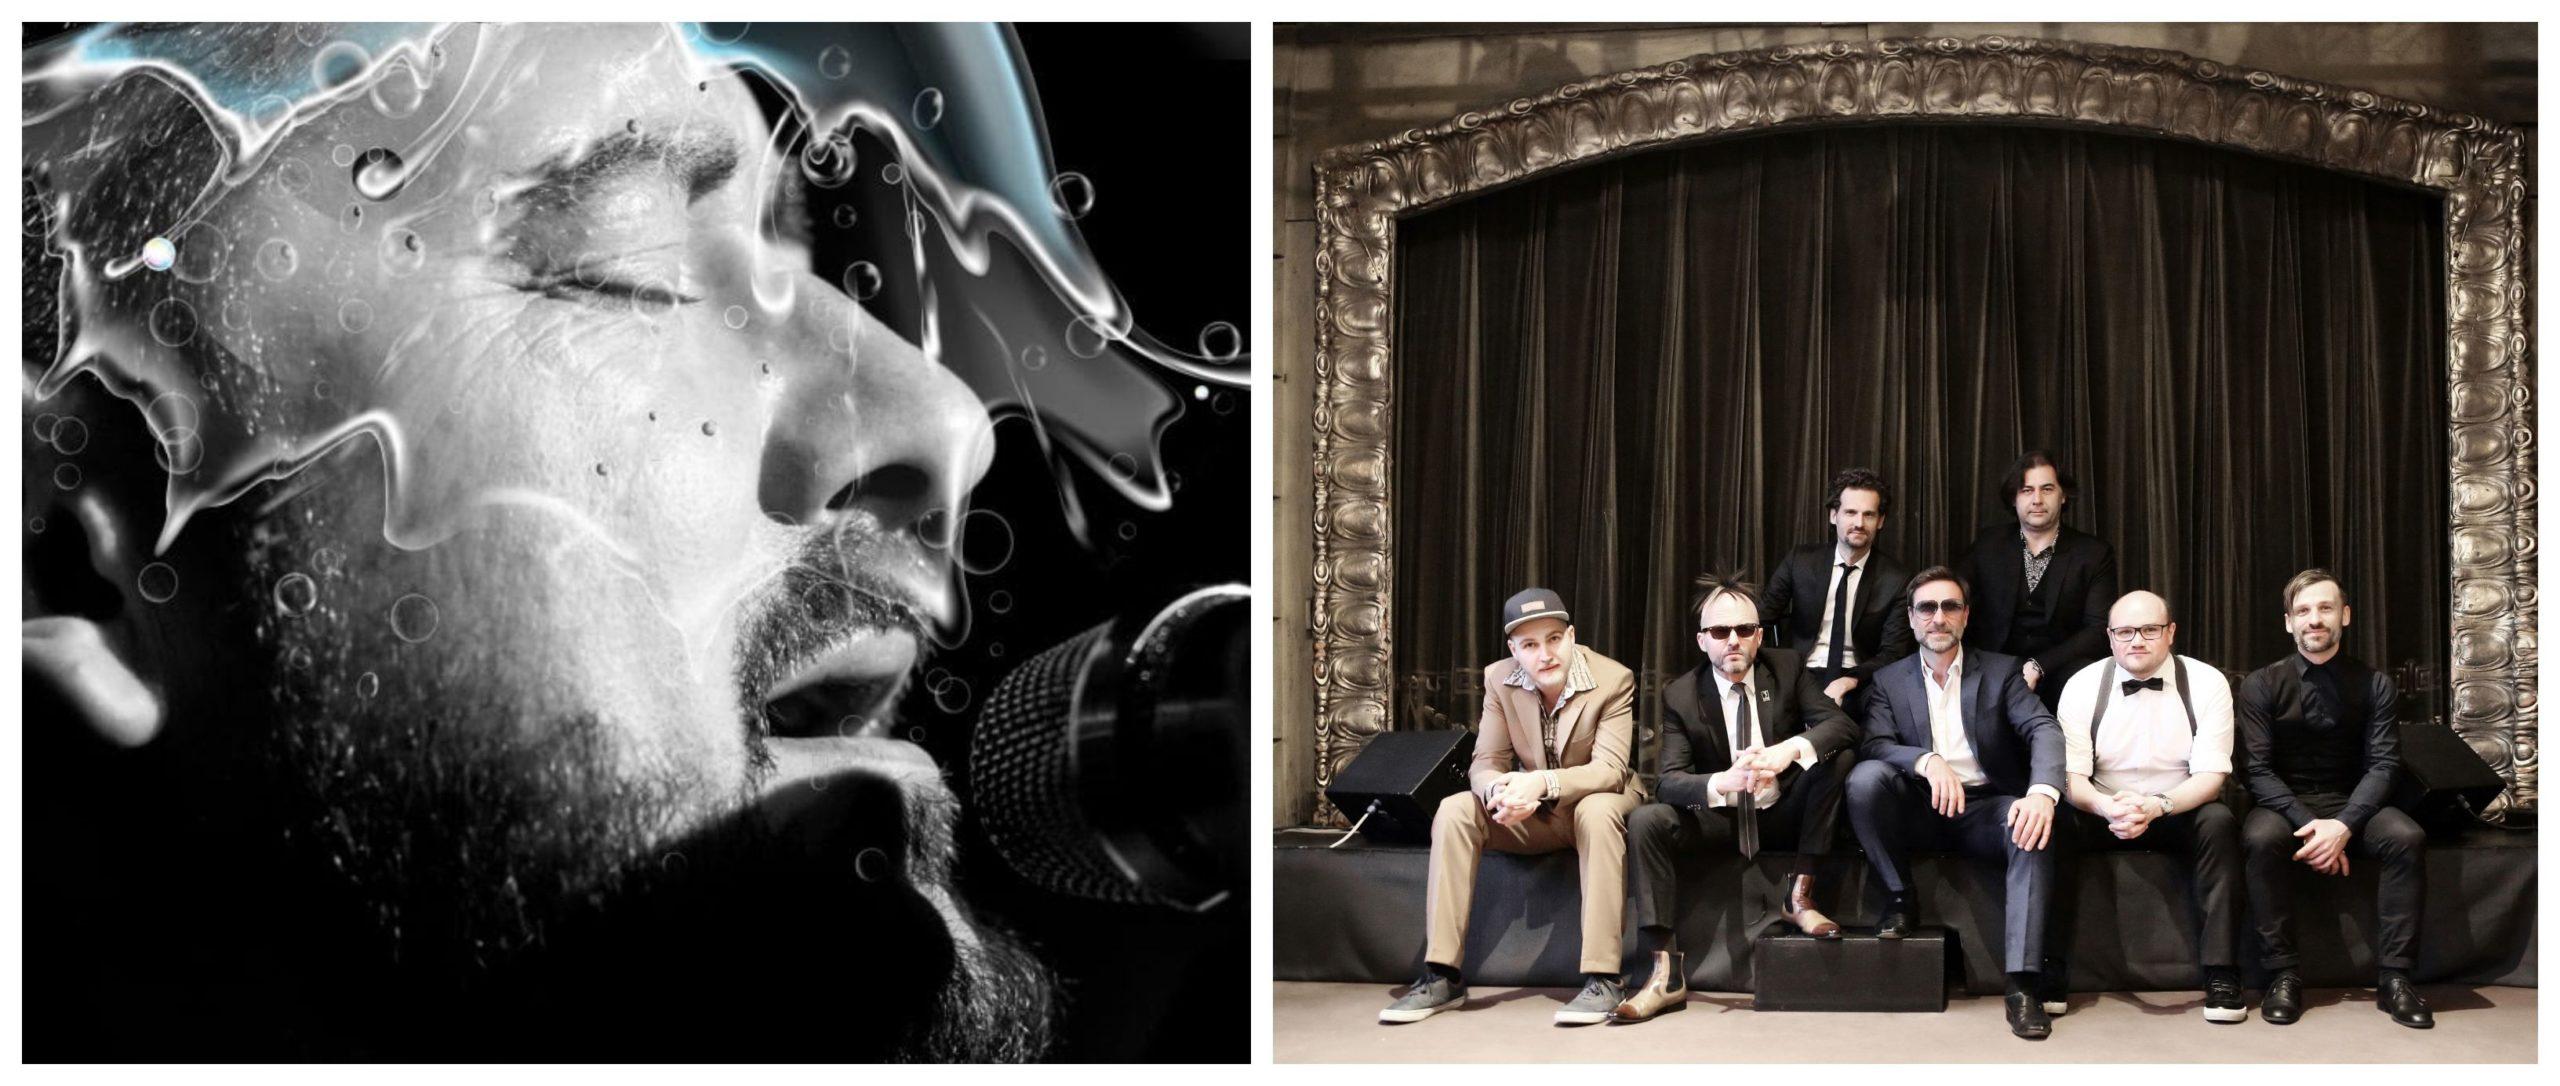 Baulücken-Konzerte 2020 Carl Avory's Rock 'n' Soul Band * Hot Pants Road Club